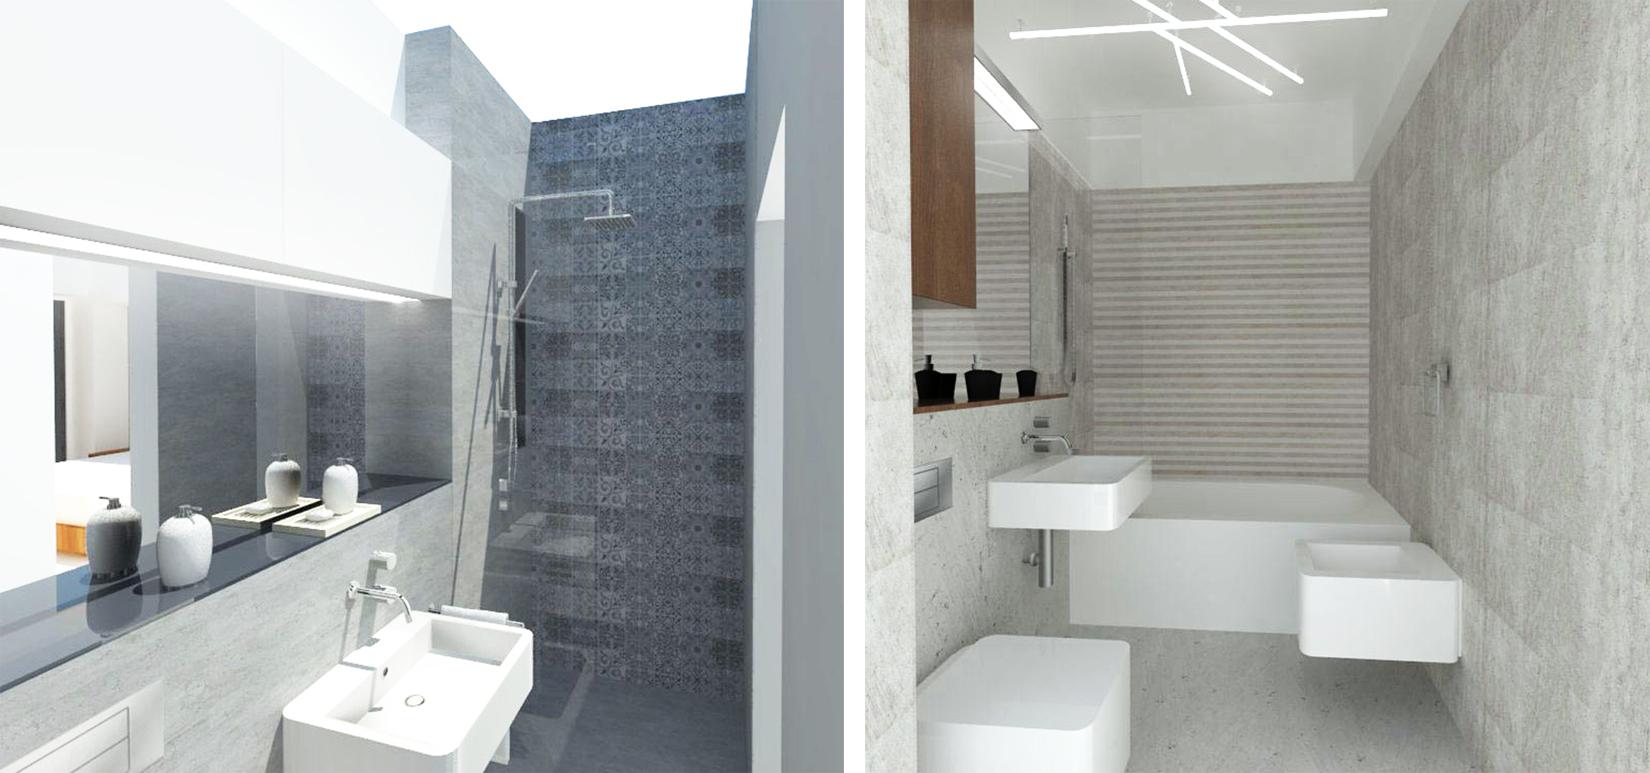 reflex-architecture_amenajare-interioara-apartament-013